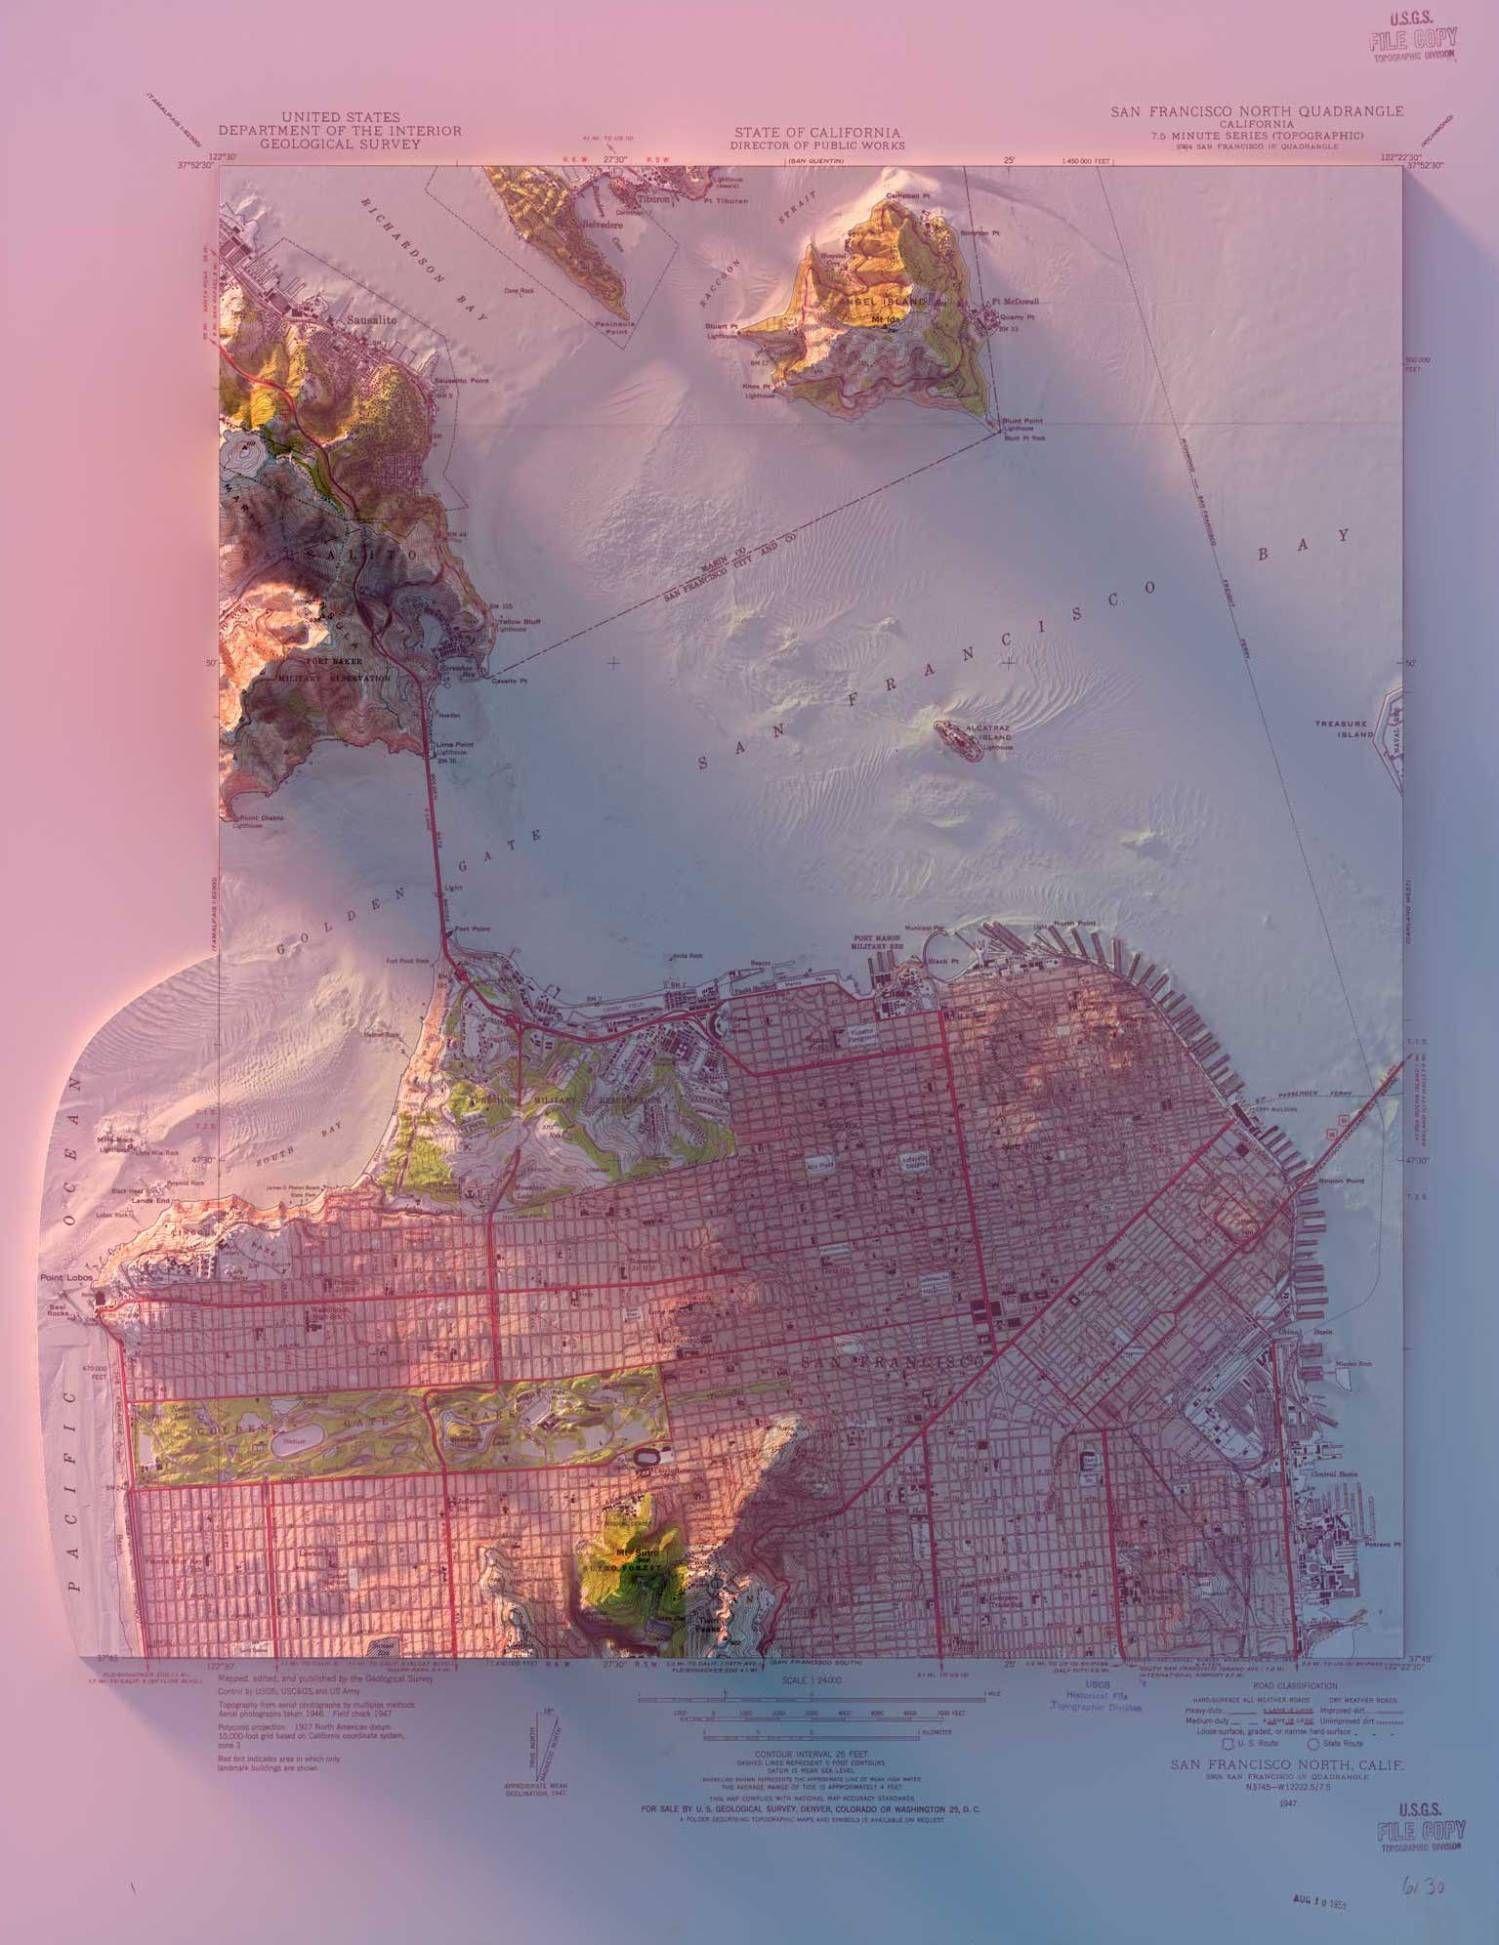 3D Map Artwork by Scott Reinhard Paranoias Map artwork